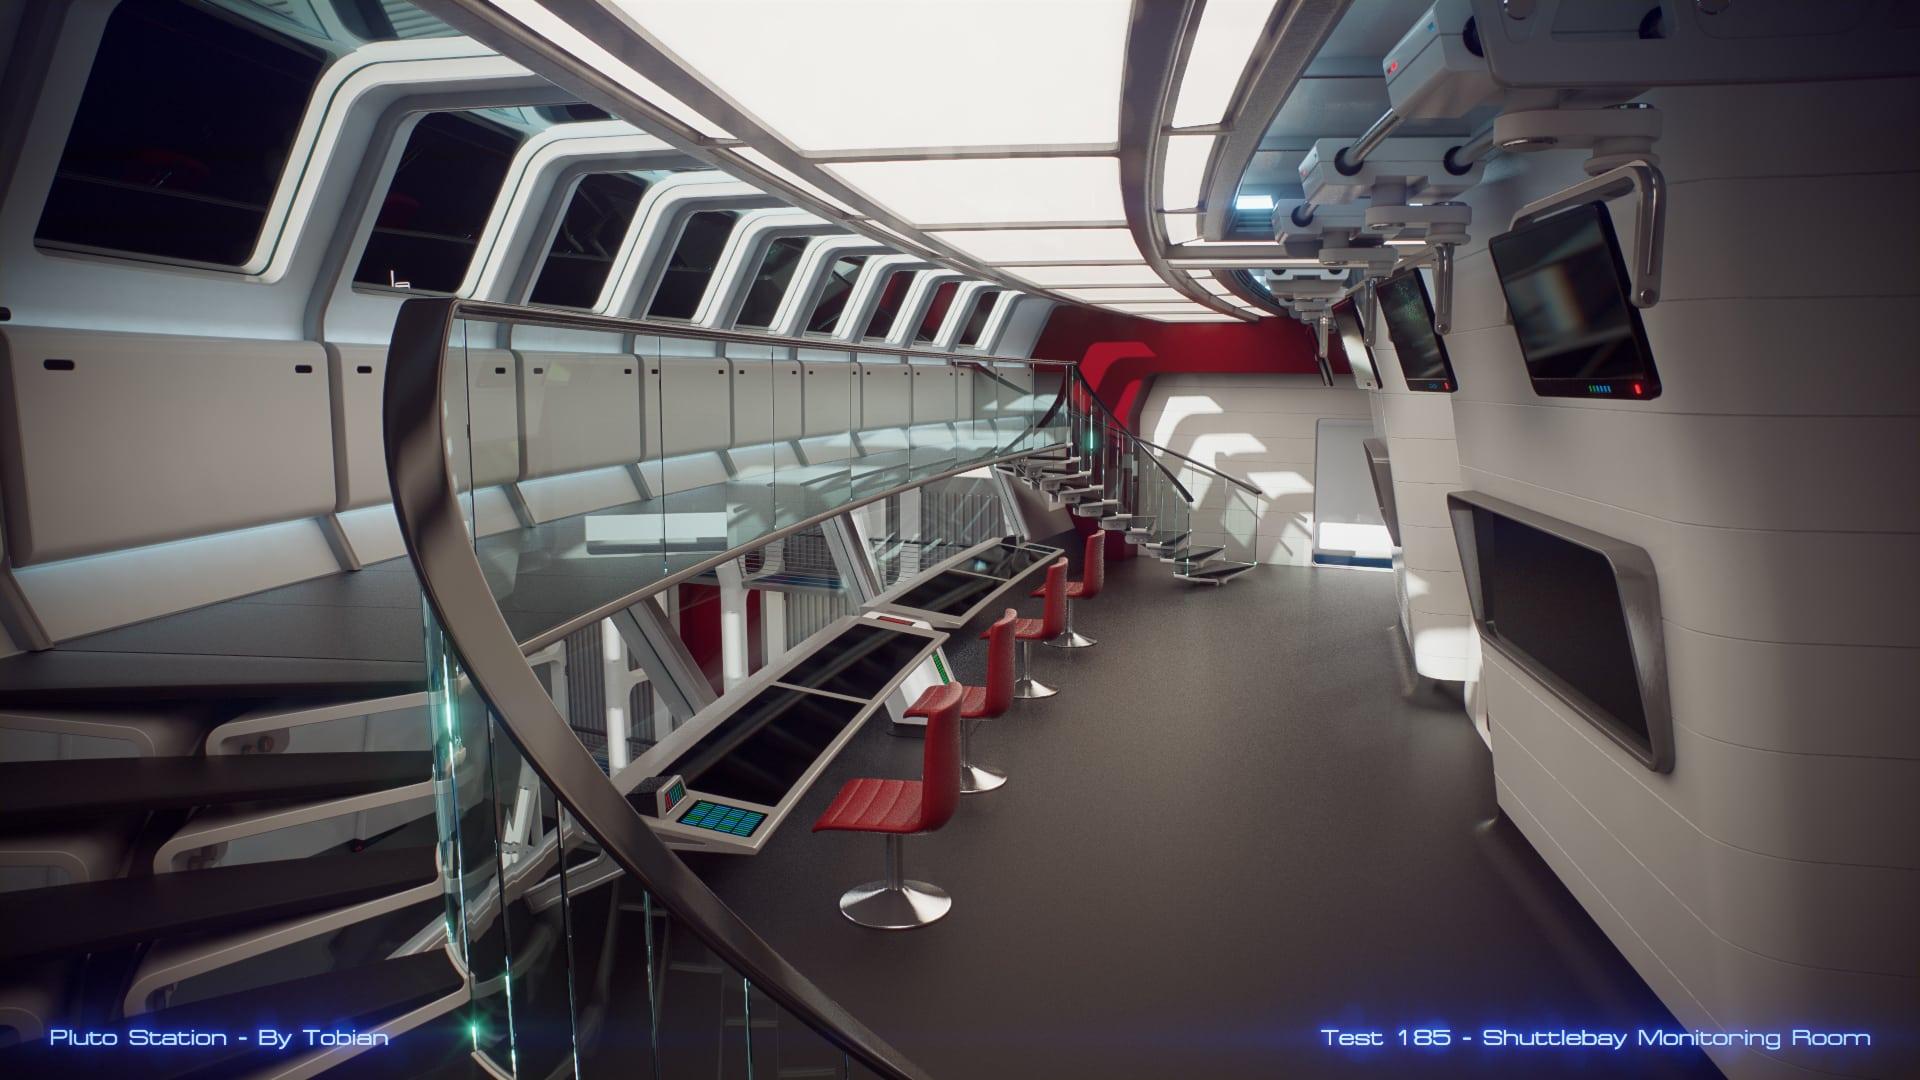 Pluto Station – Shuttlebay Monitoring Room